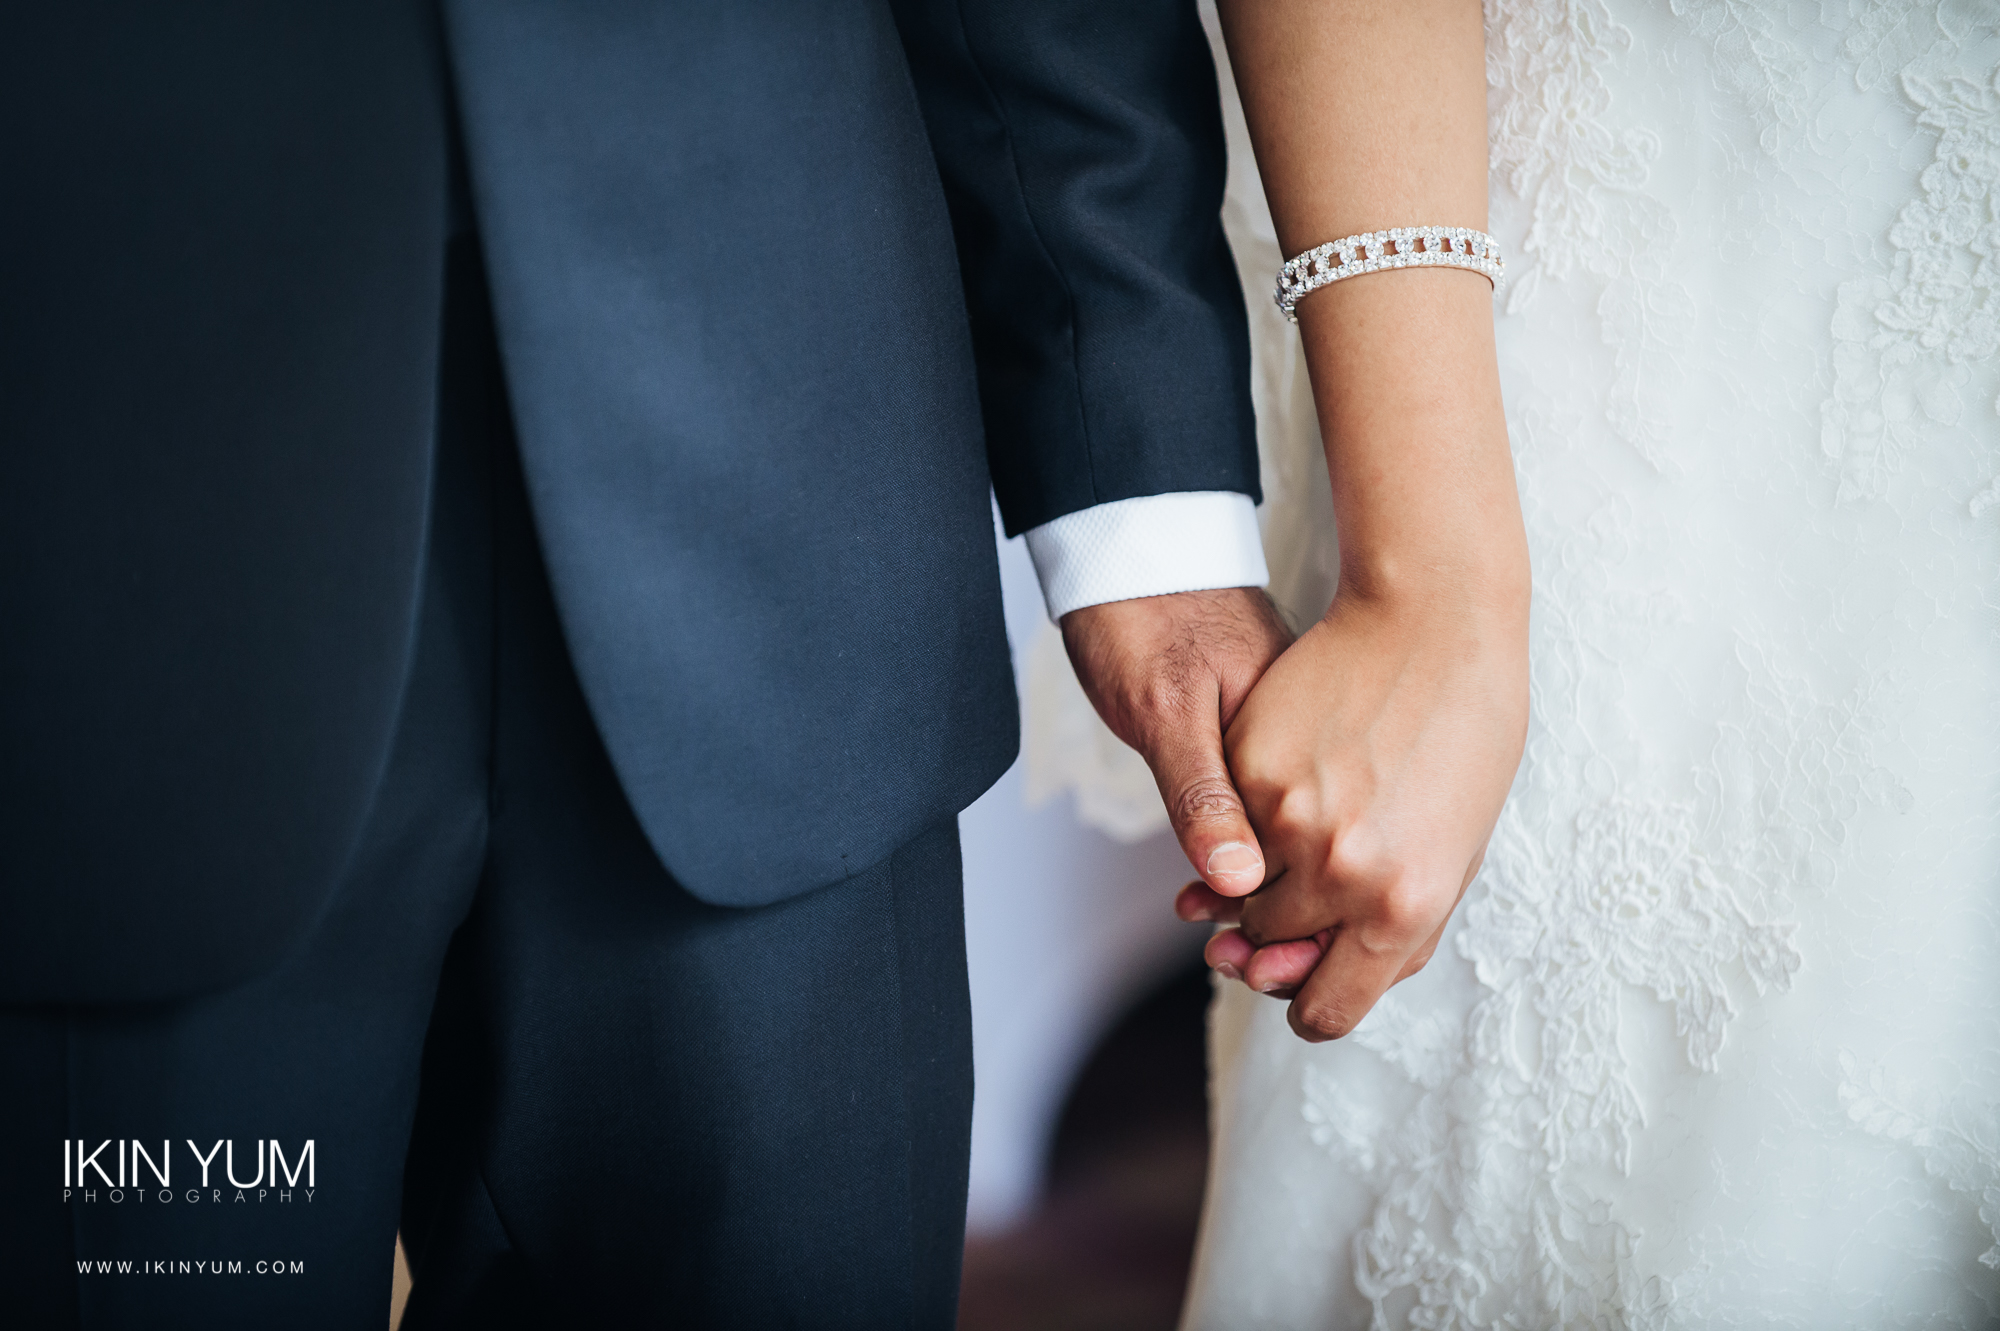 Laura Ashley Manor Wedding - Ikin Yum Photography-051.jpg